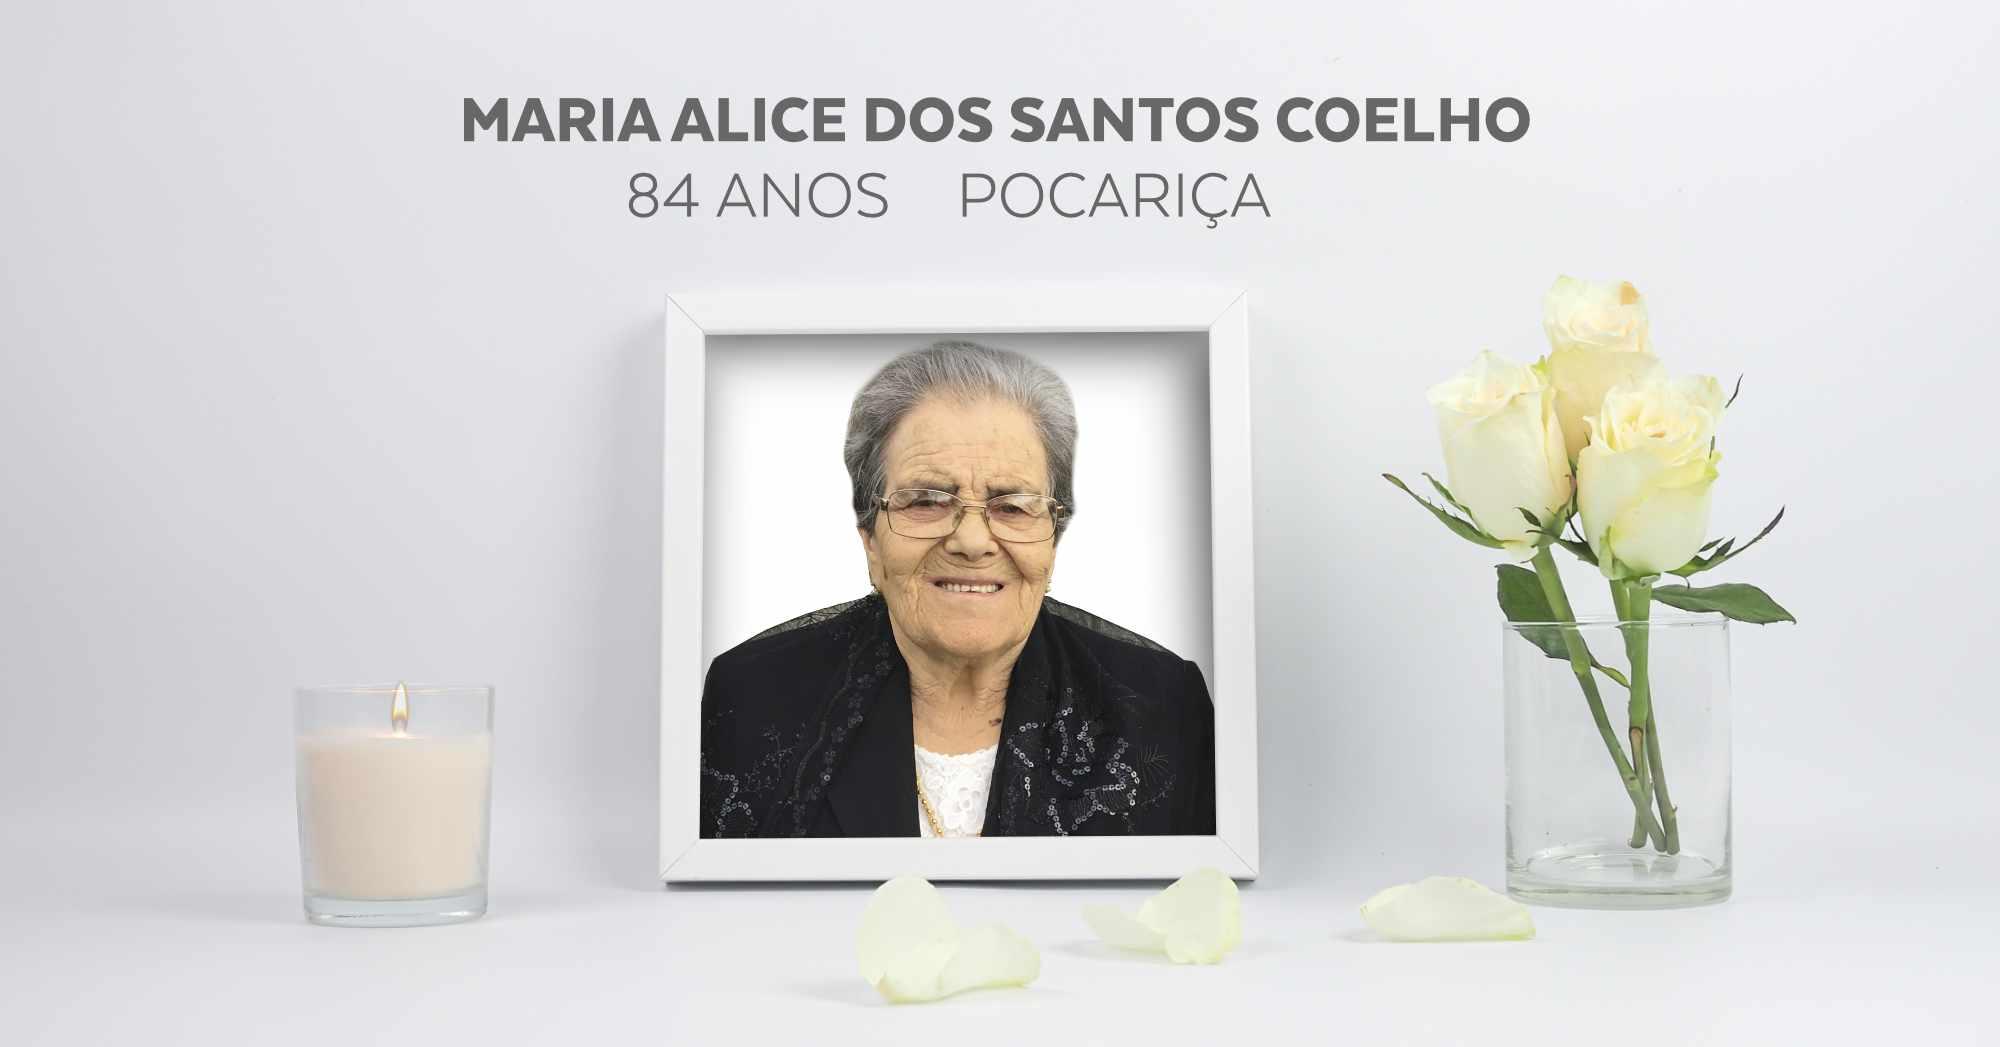 Maria Alice dos Santos Coelho